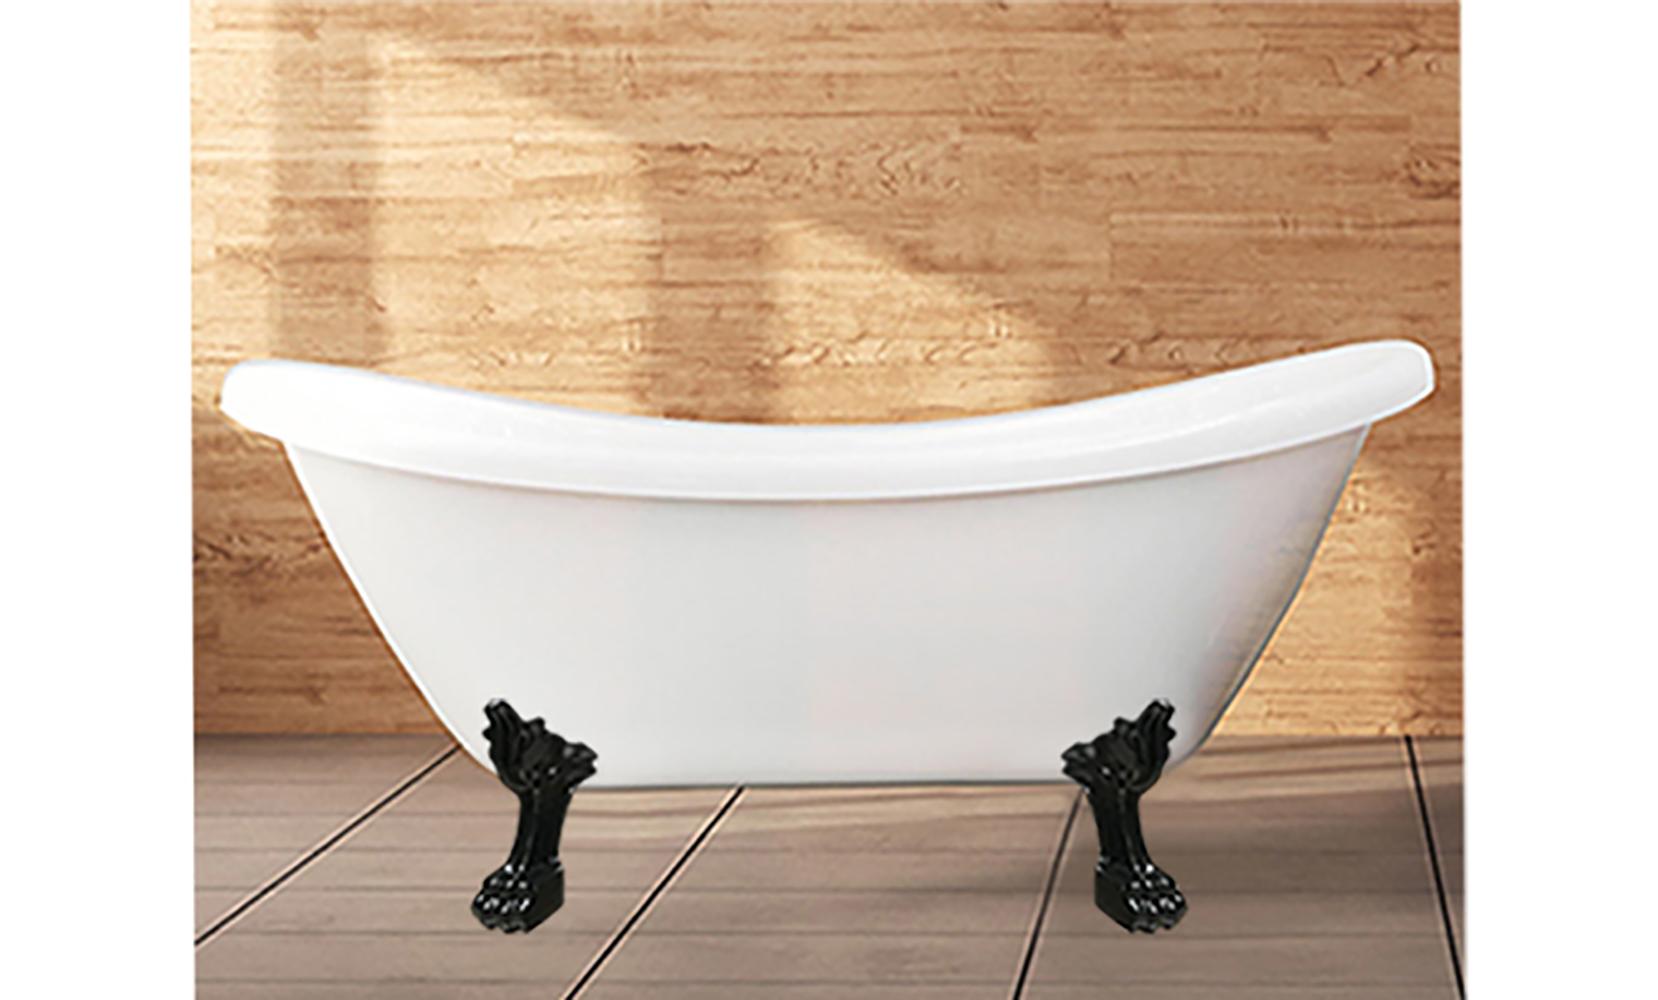 single-tub-claws-white-tub-black-claws.jpg